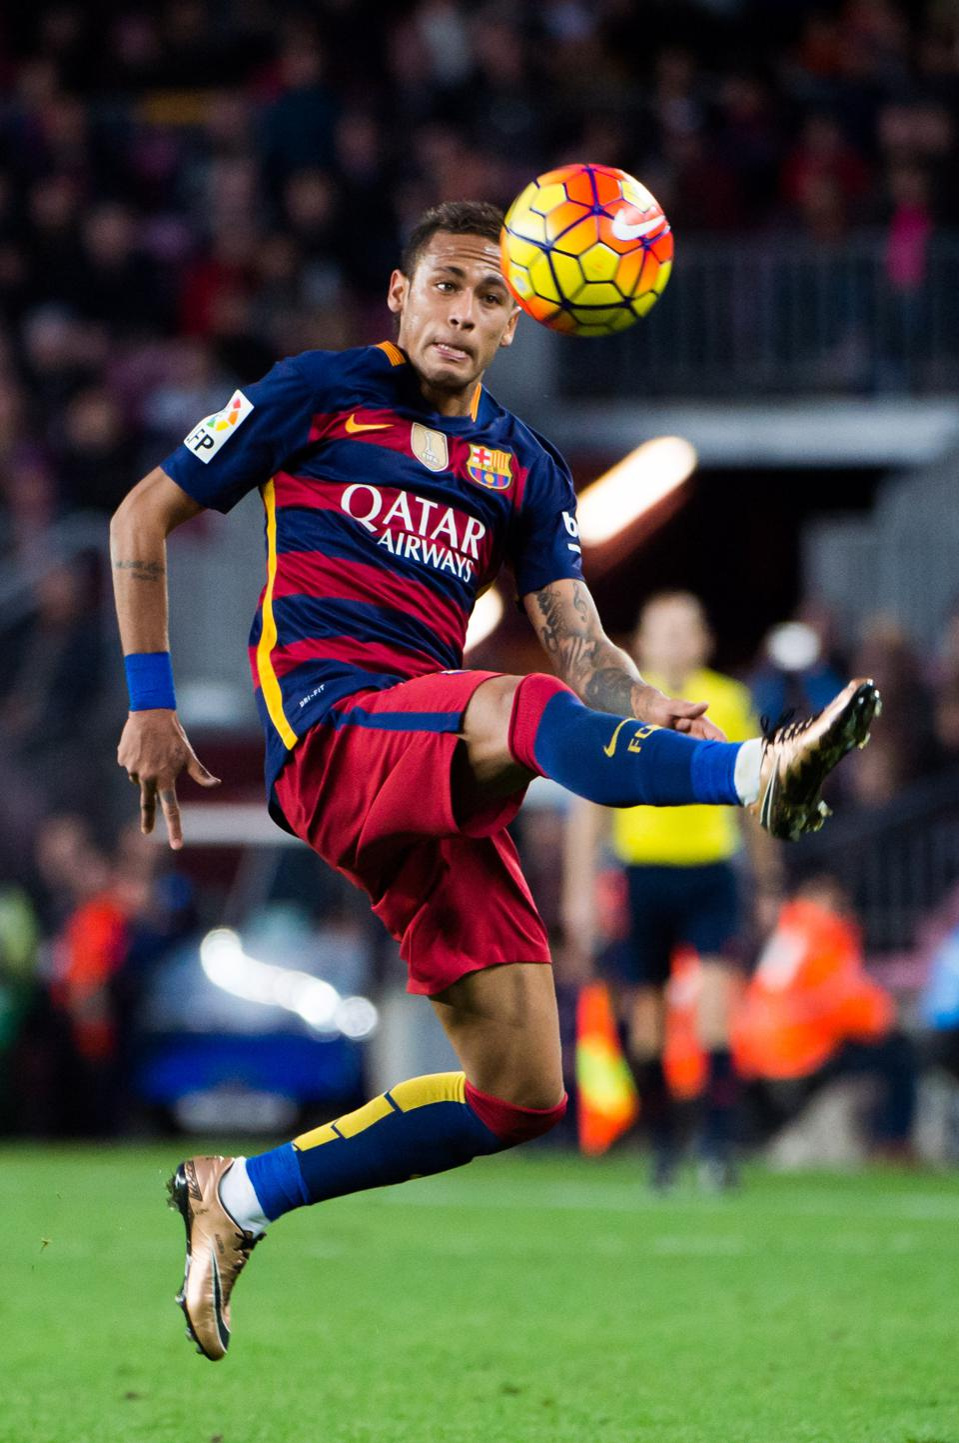 La Liga: Barcelona's Foresight May Usurp Real Madrid As La Liga